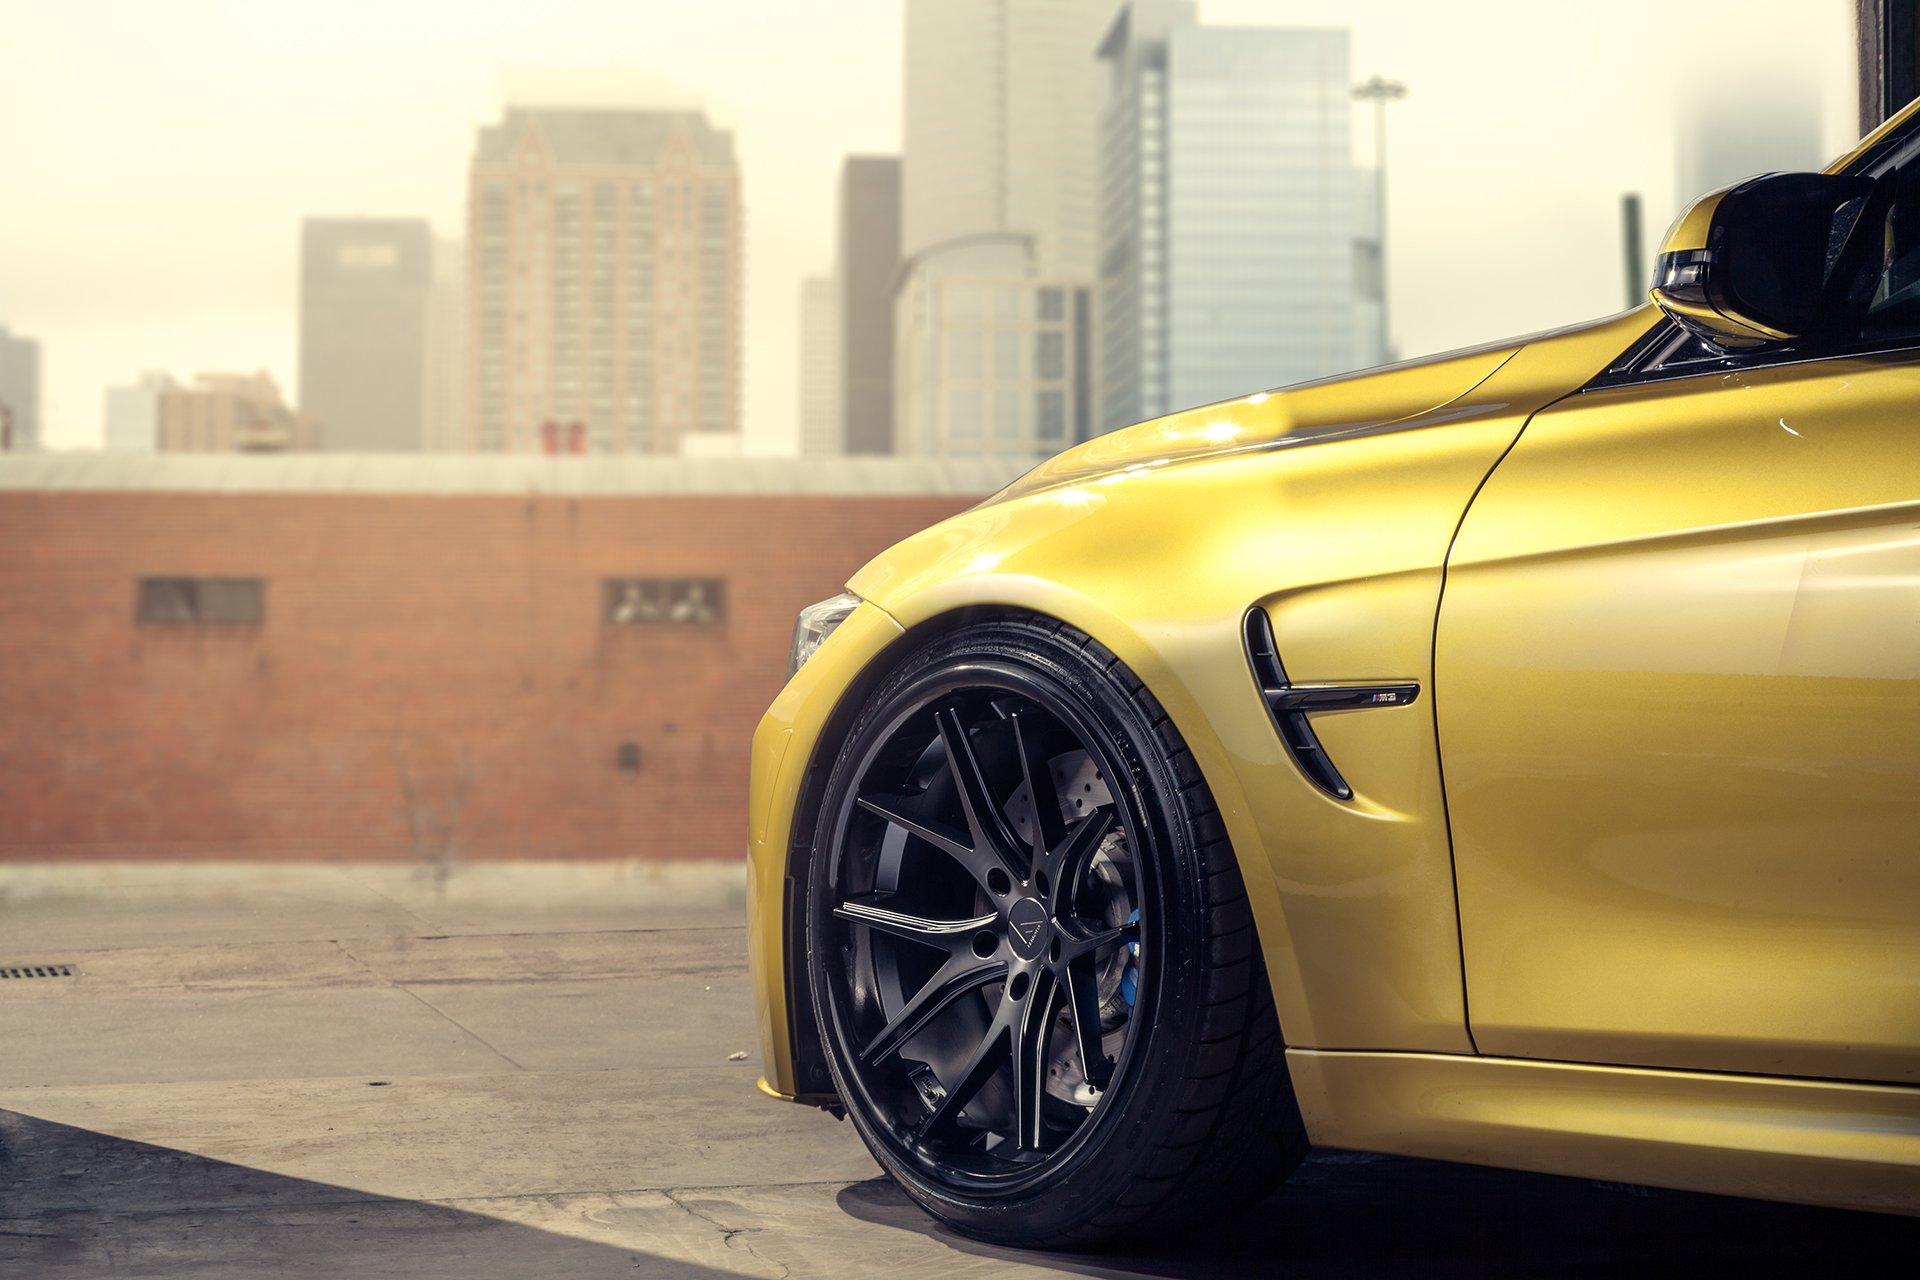 G37 Sedan Rims Top Deals Lowest Price Infiniti Wheels 20 Inch Ferrada Fr2 Matte Black Gloss Lip Concave Set